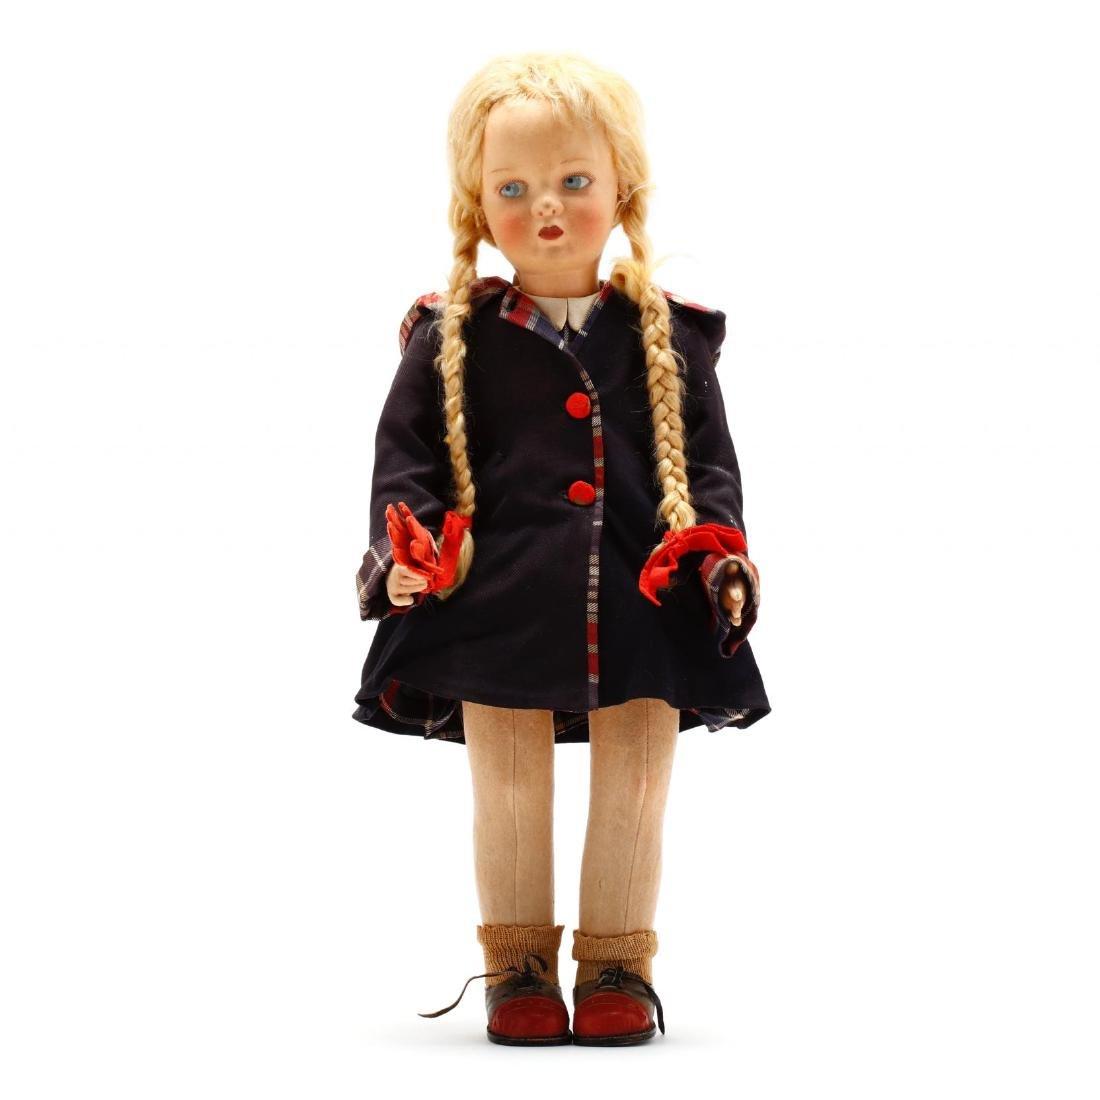 Vintage Lenci Doll